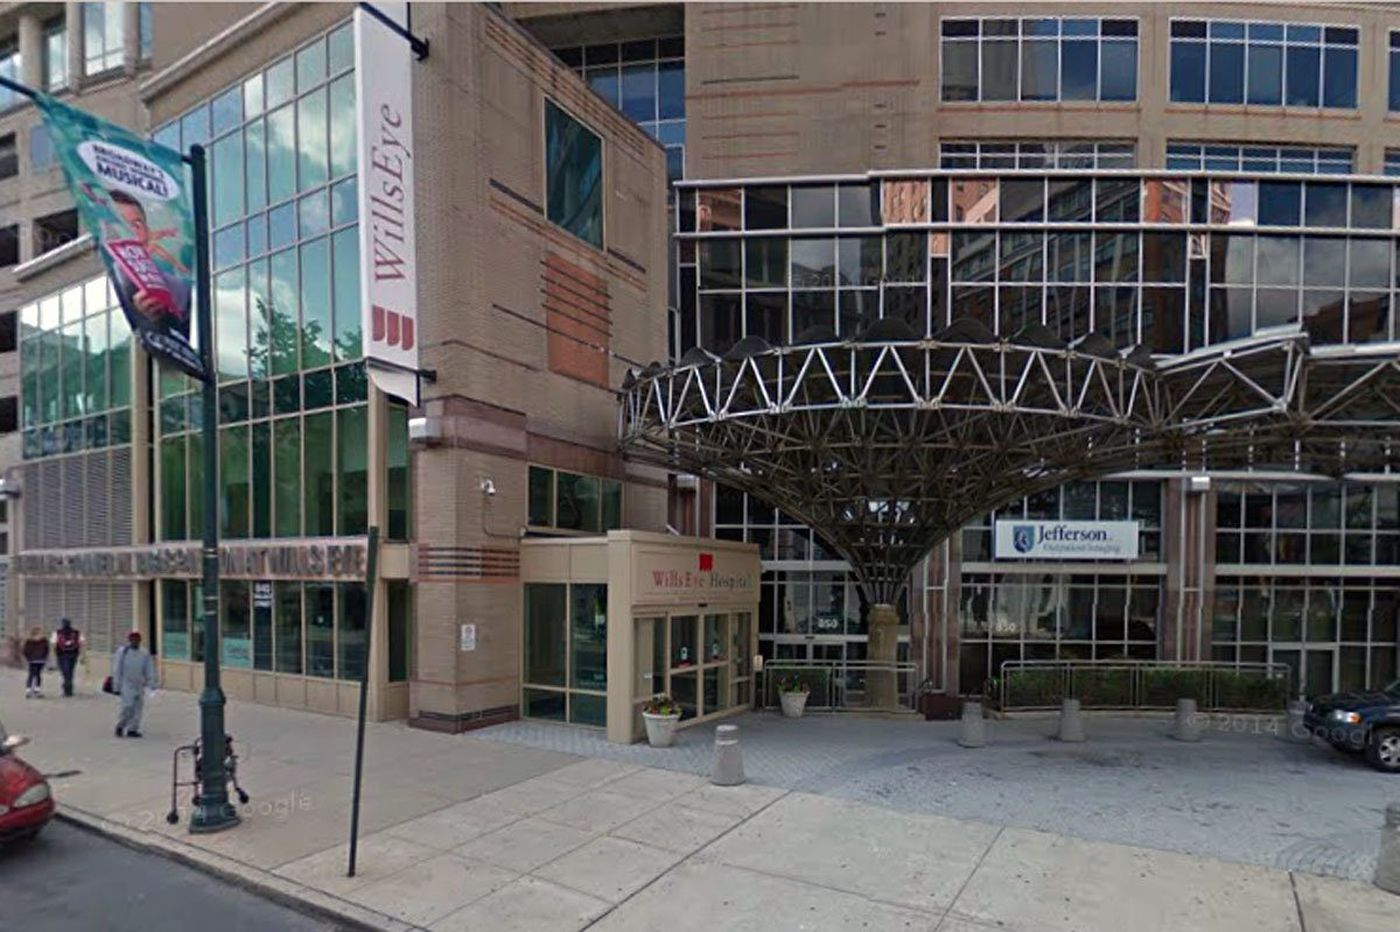 Wills Eye in Philly marks a huge win, regaining hospital status under Medicare